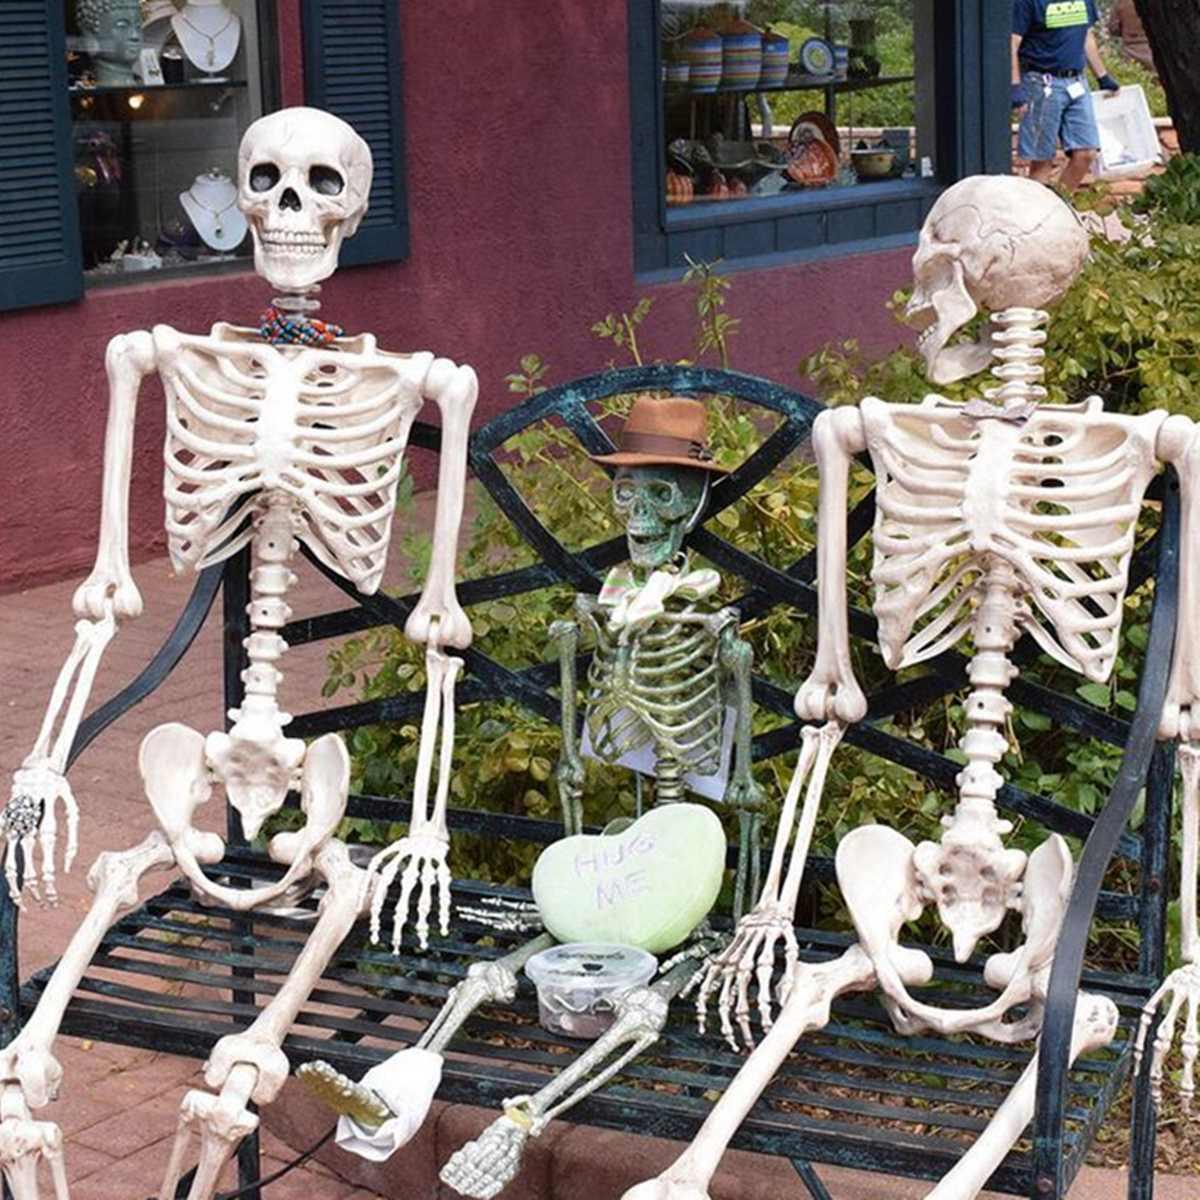 170CM Skeleton Human Halloween Prop PVC Skeleton Bones Horror Human Bones  For House Party Halloween Decoration 2019 New